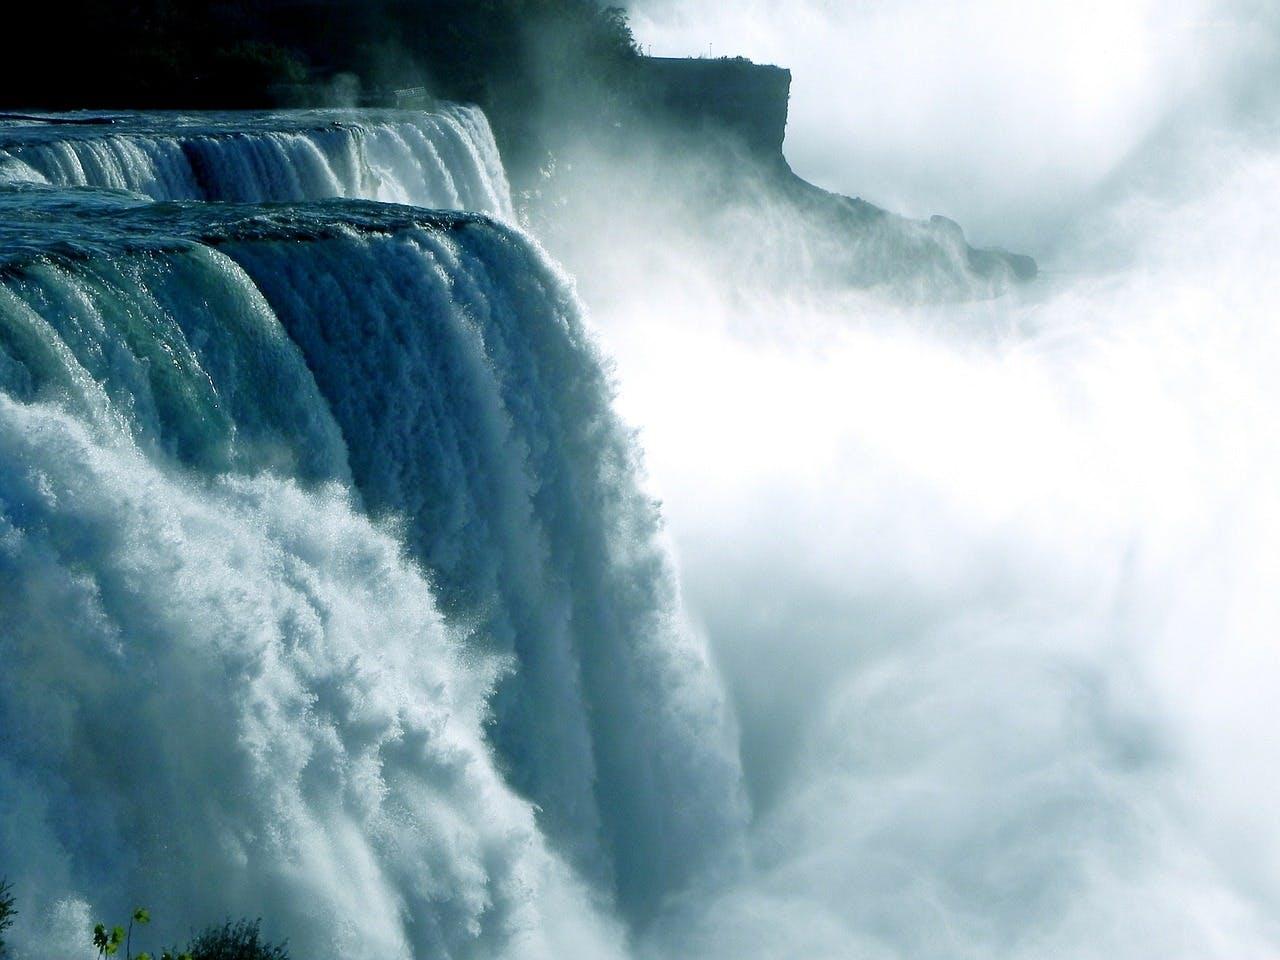 Photo Les chutes du Niagara - Canada